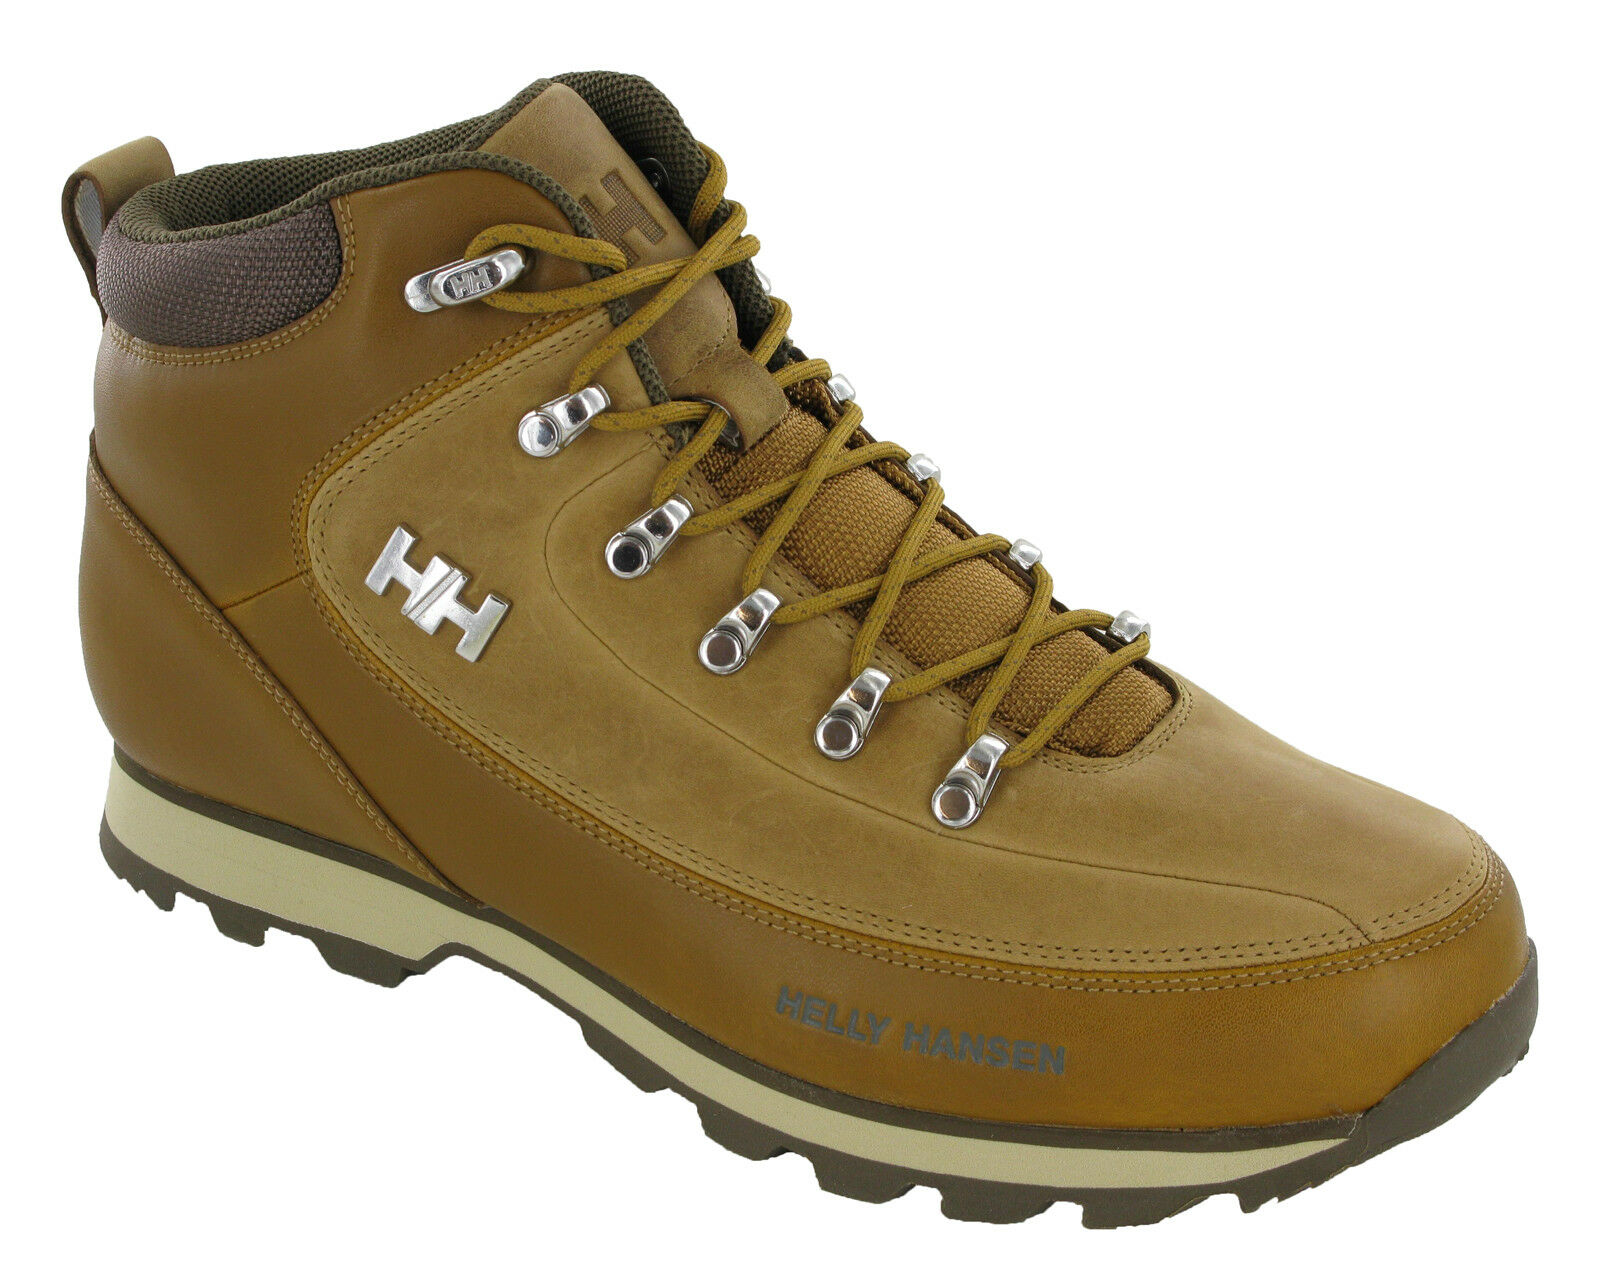 Helly Hansen Homme Bottes Sports Casual Walking Cheville Eau Répulsif Chaussures